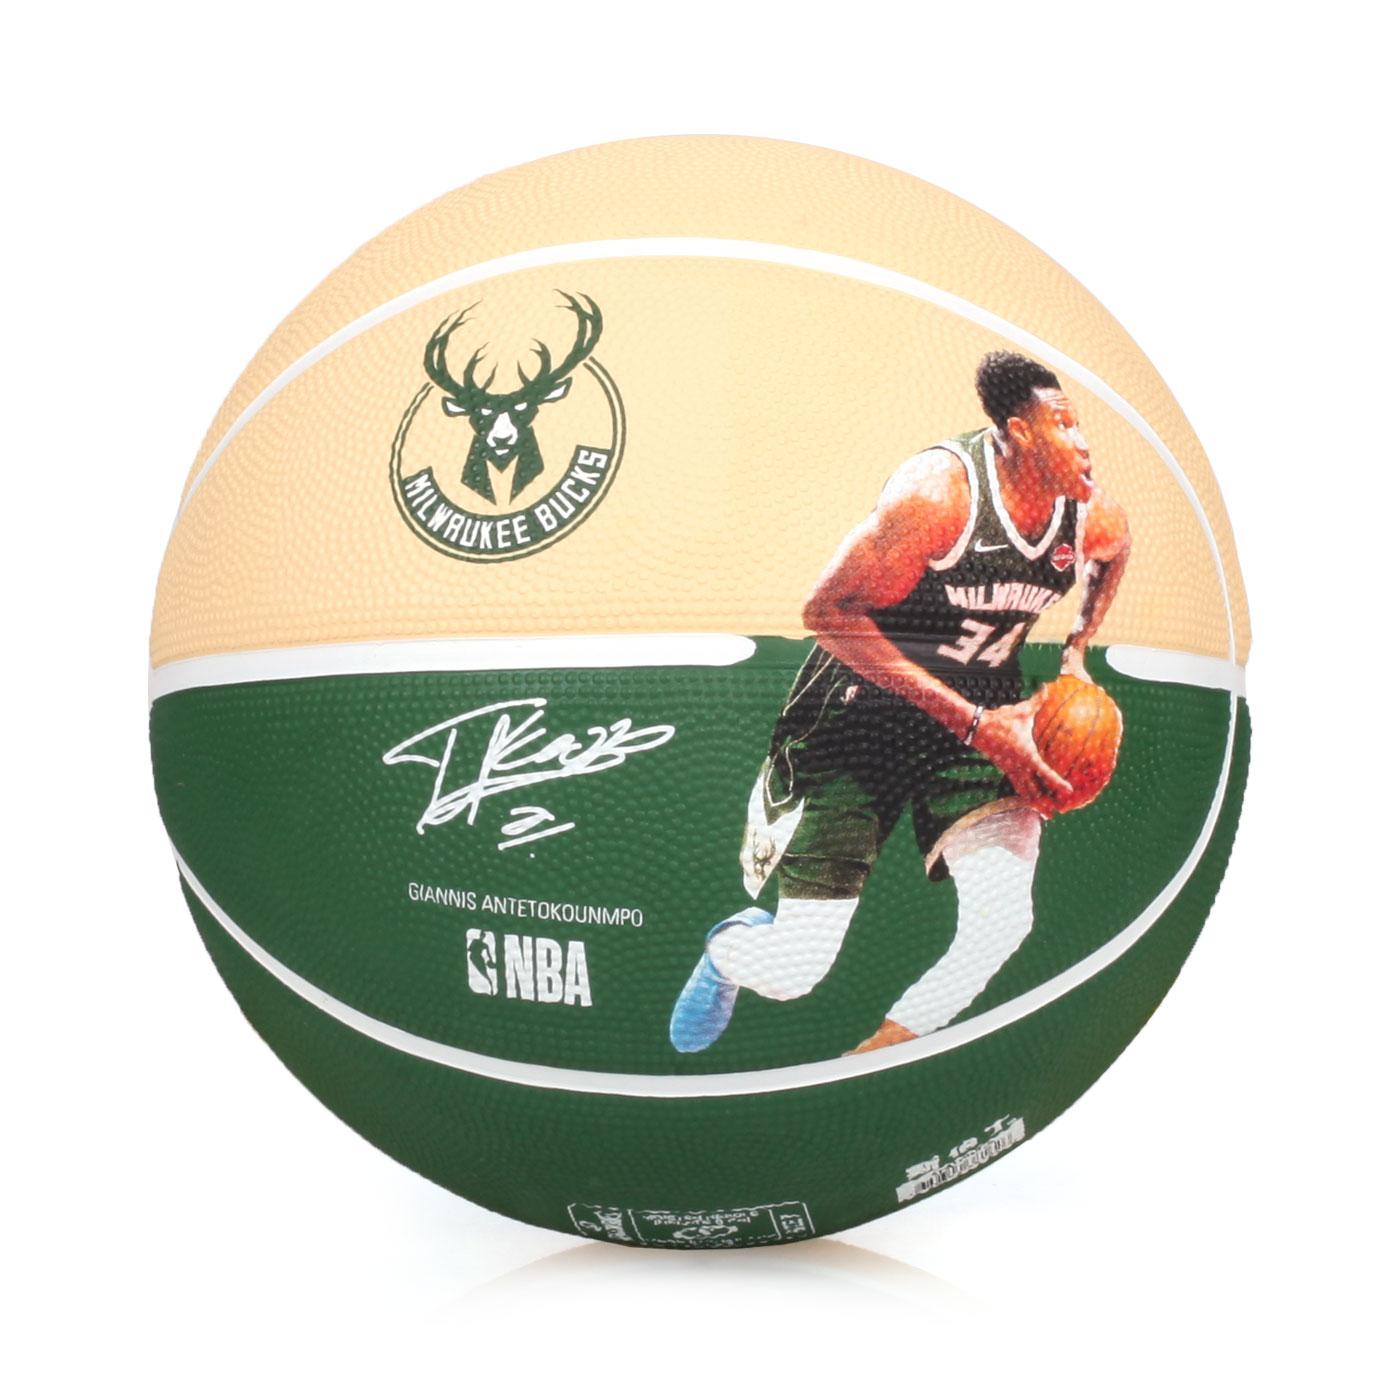 SPALDING 公鹿 Antetokounmpo 籃球 #SPA38162 SPA83836 - 綠黃